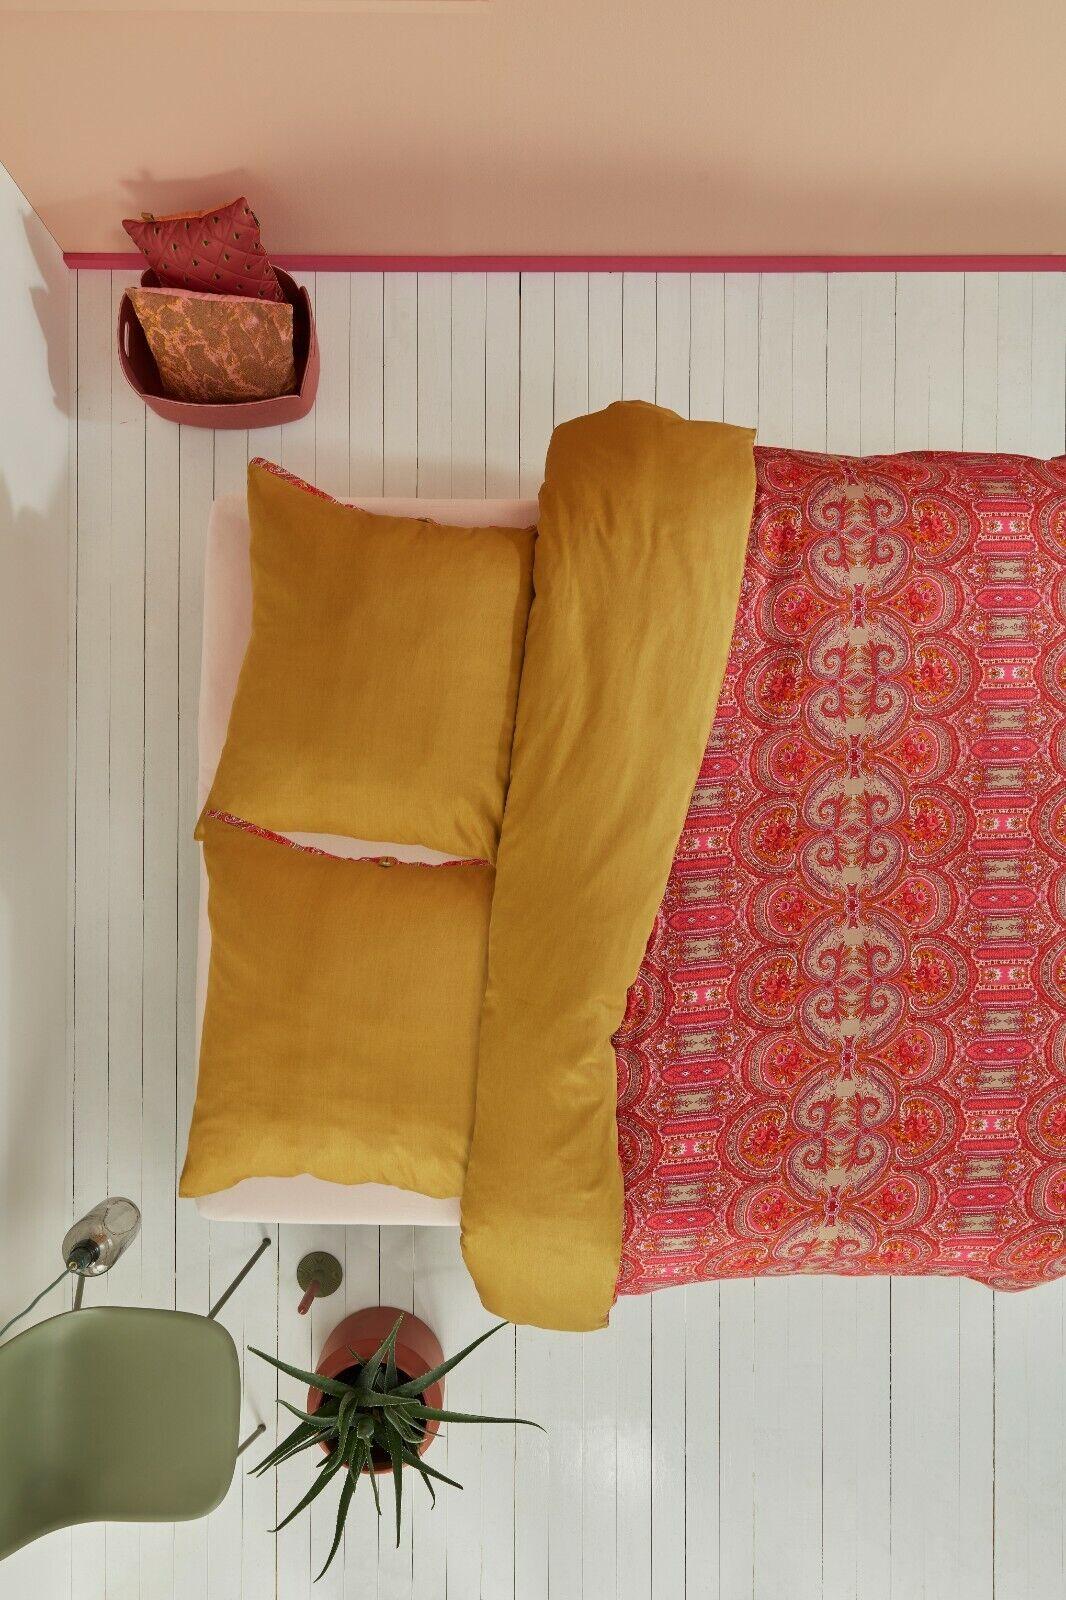 Oilily Mako Satin Bettwäsche Paisley Ovation Gold 135x200 oder 155x220 cm